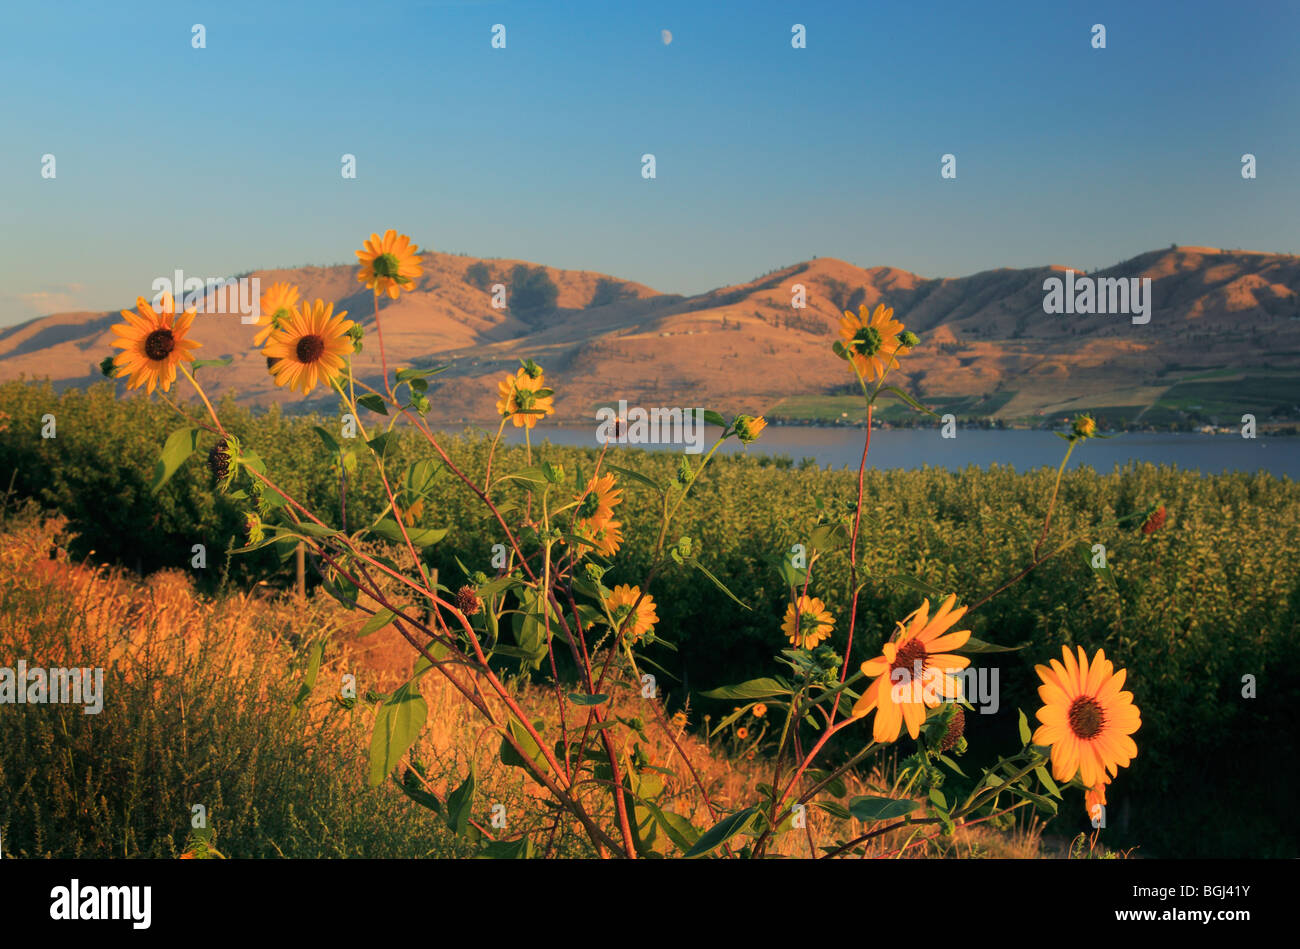 Sunflowers near Lake Chelan in eastern Washington state - Stock Image